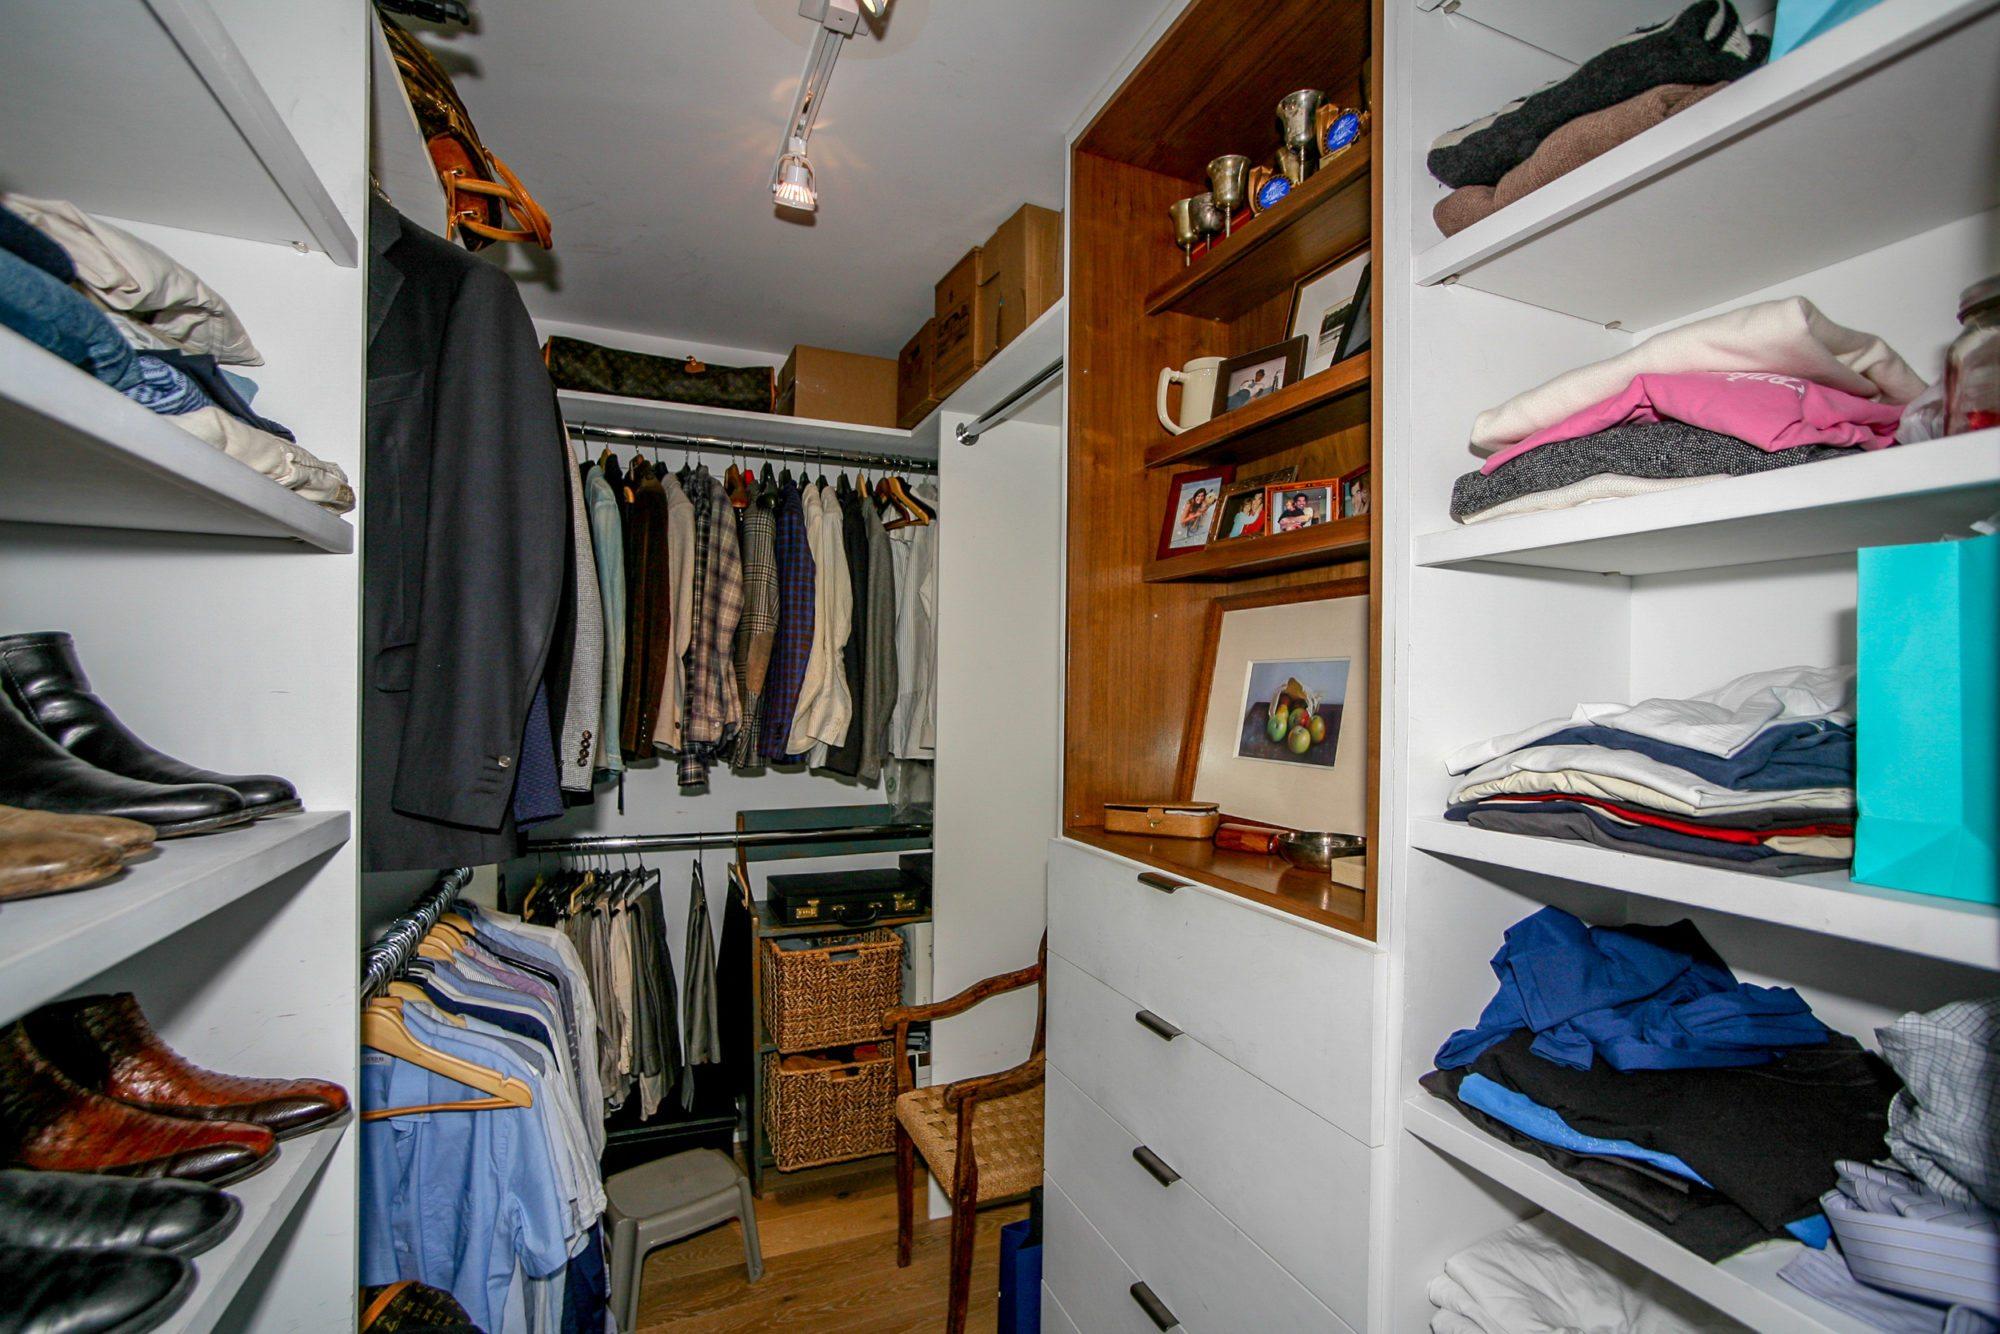 toronto-condo-for-sale-78-tecumseth-street-8